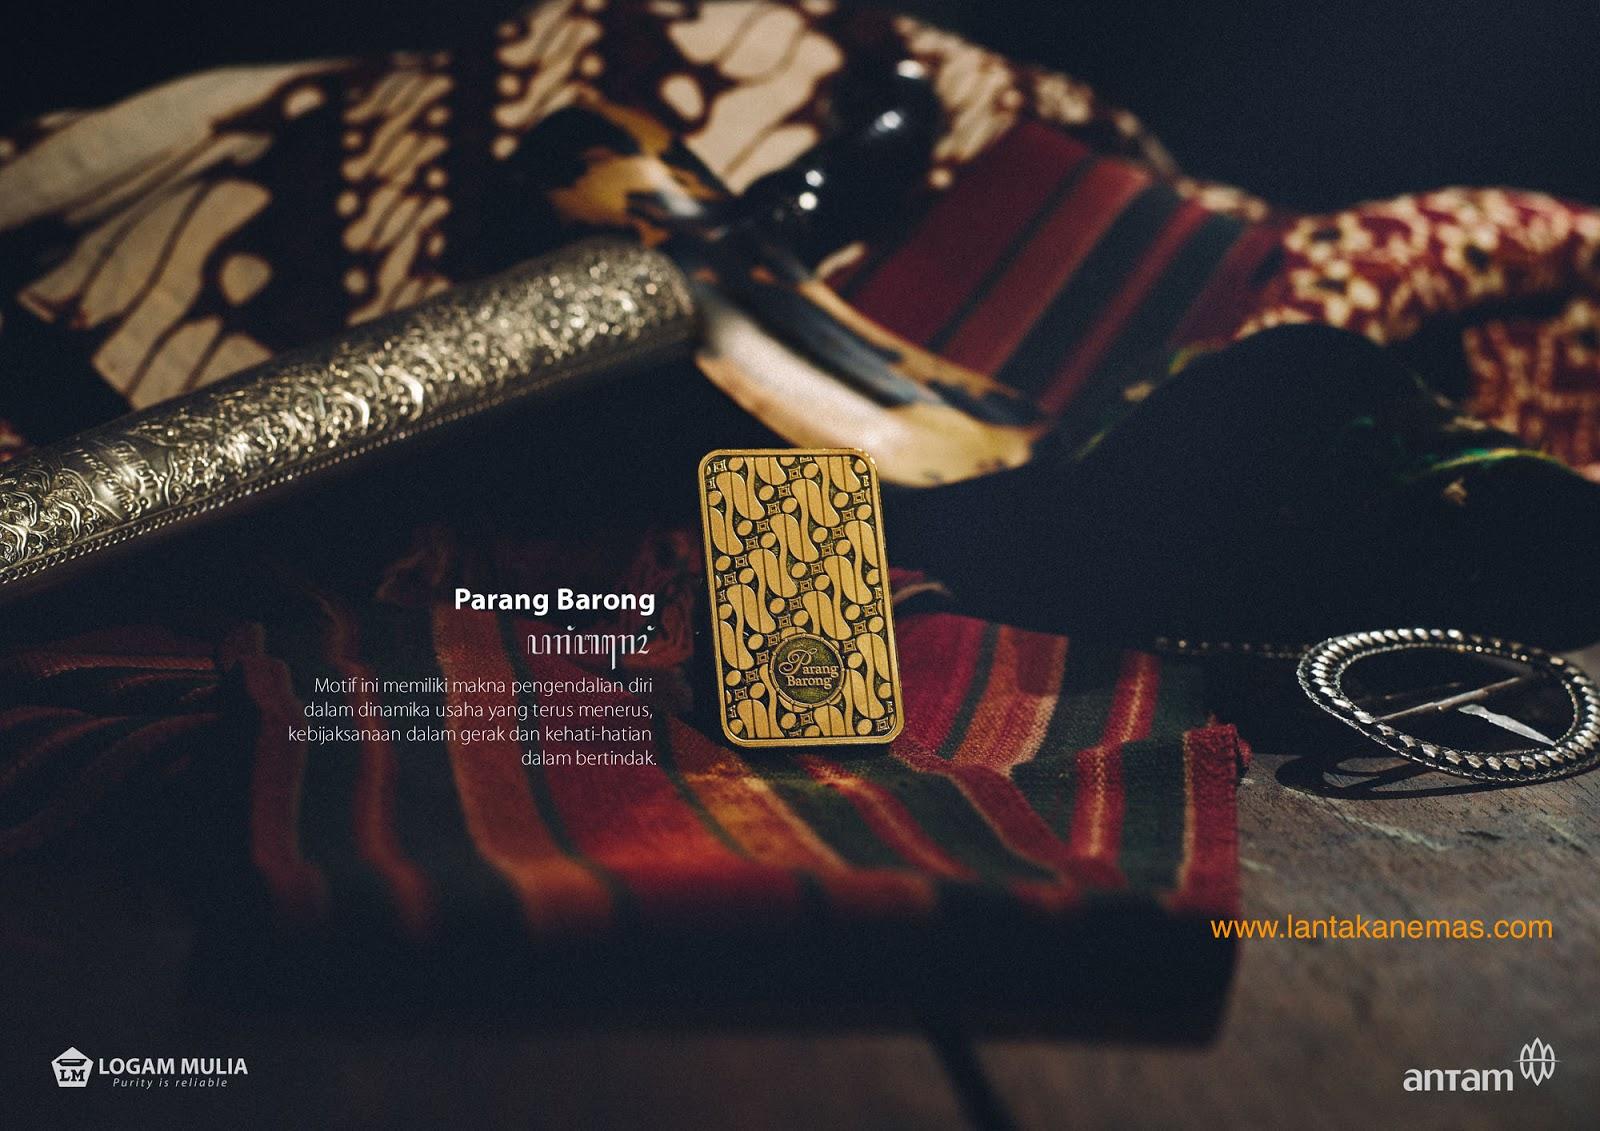 Batik Dan Logam Mulia Oleh Naftalia Kusumawardhani Halaman All